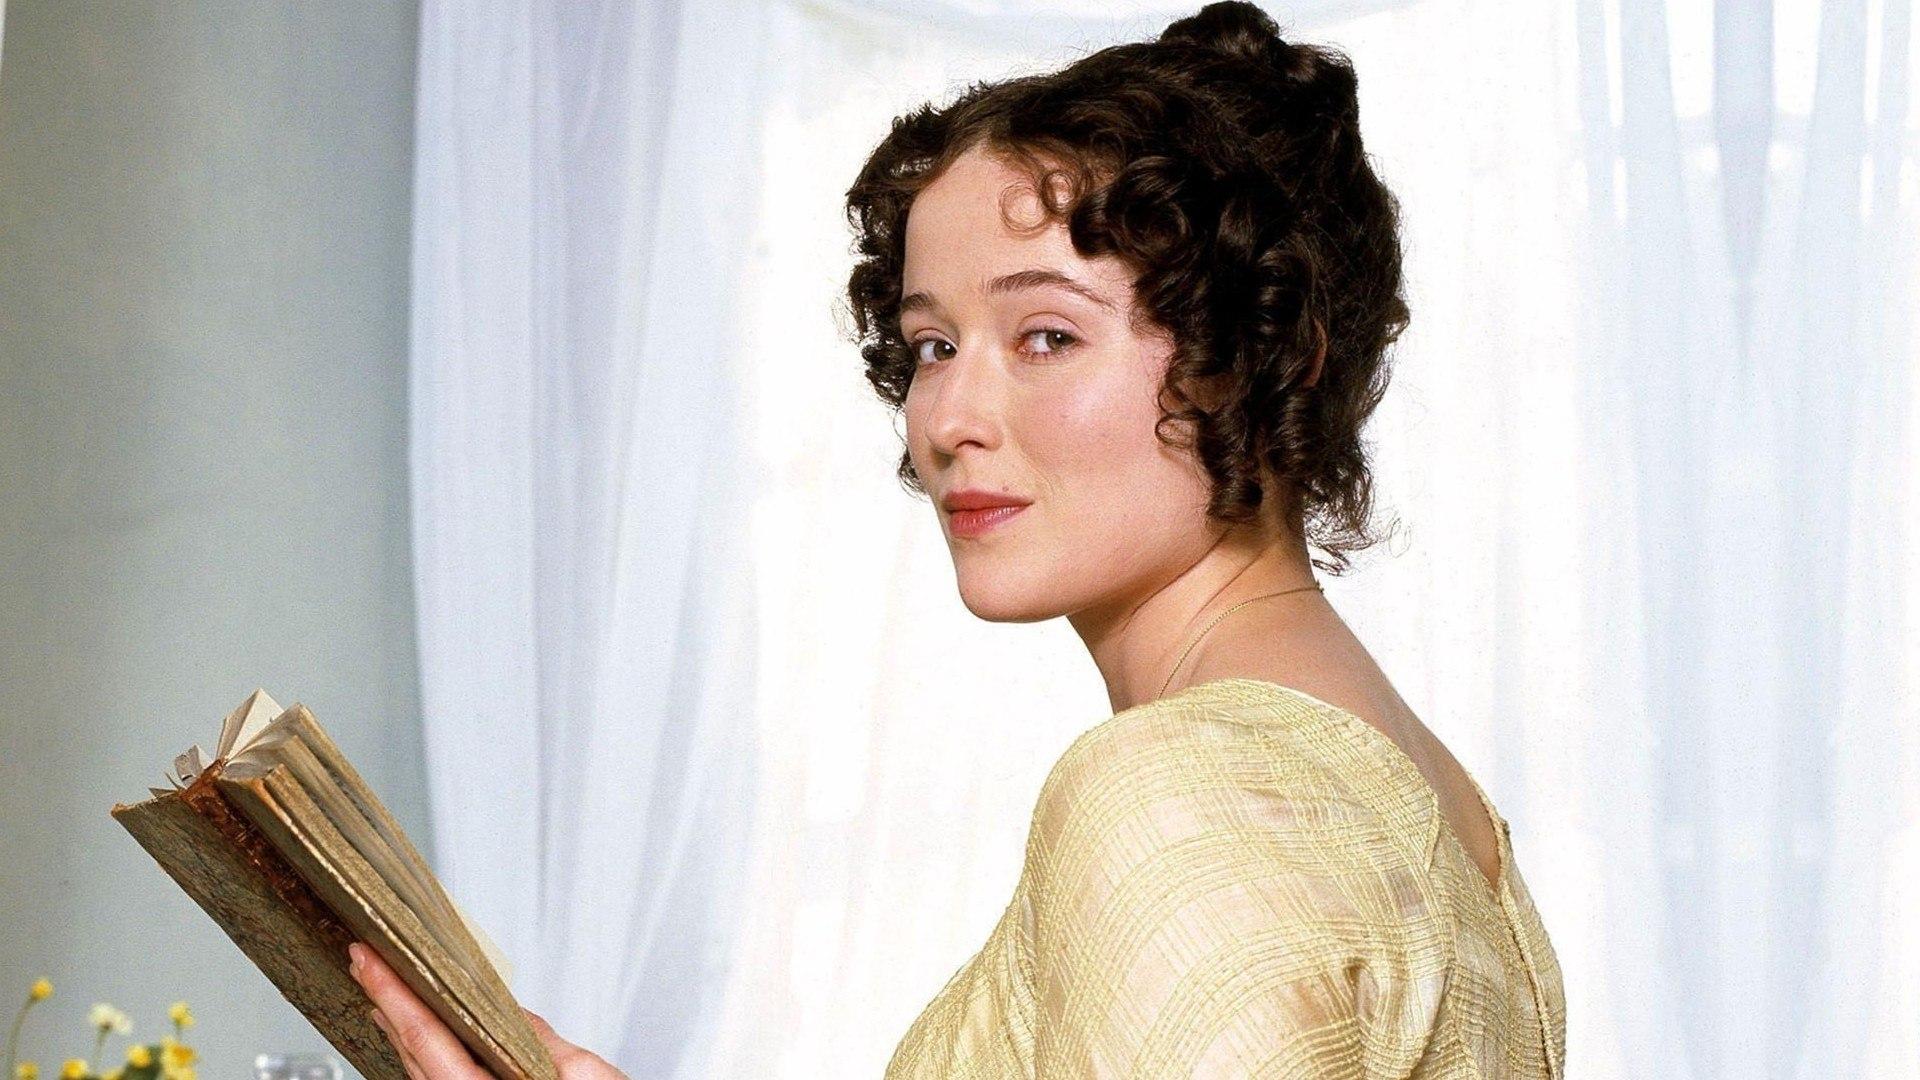 Ehle as Elizabeth Bennet